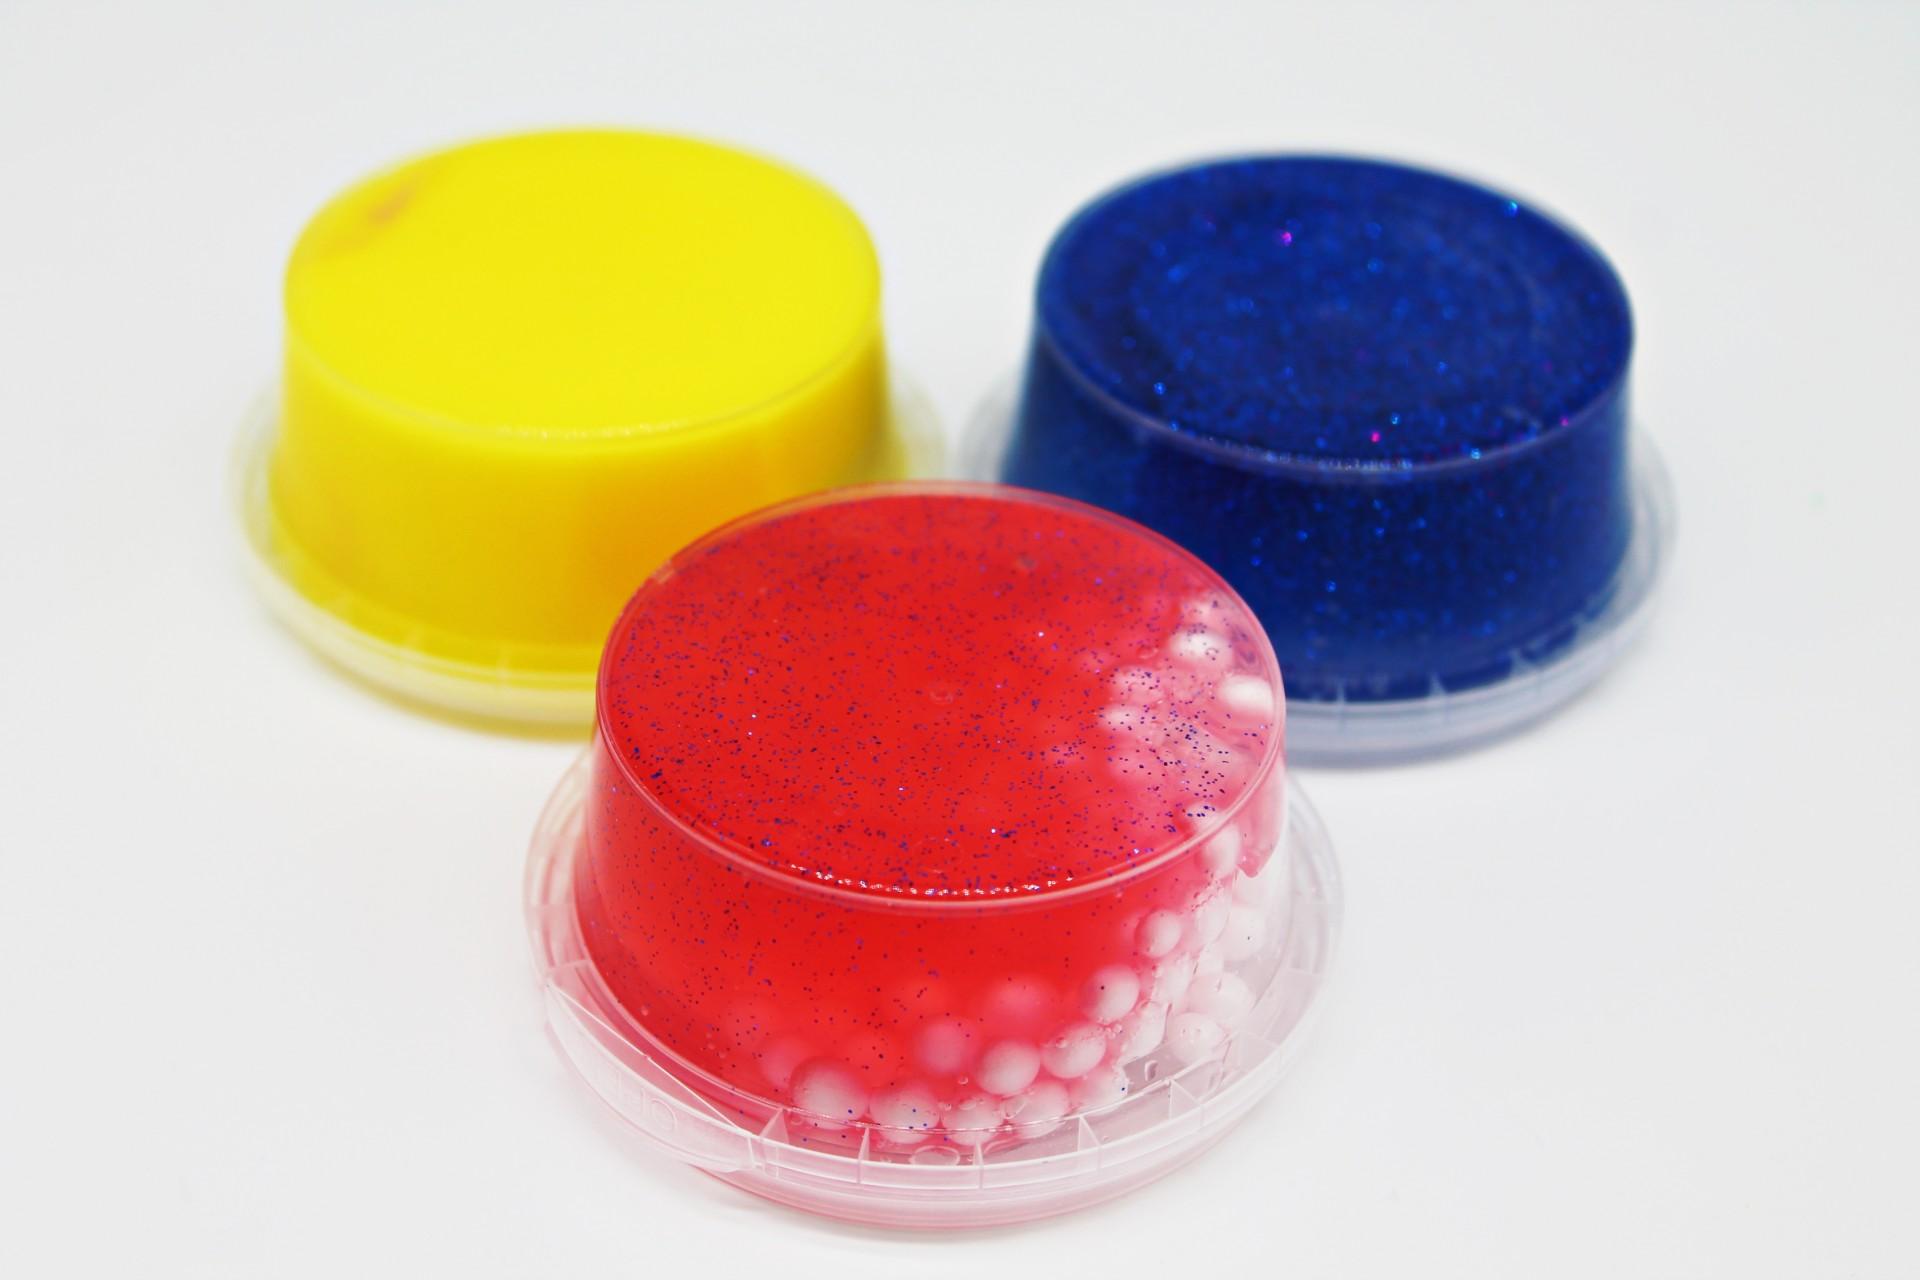 PROMOÇÃO: slime individual líquida - Pack de 2